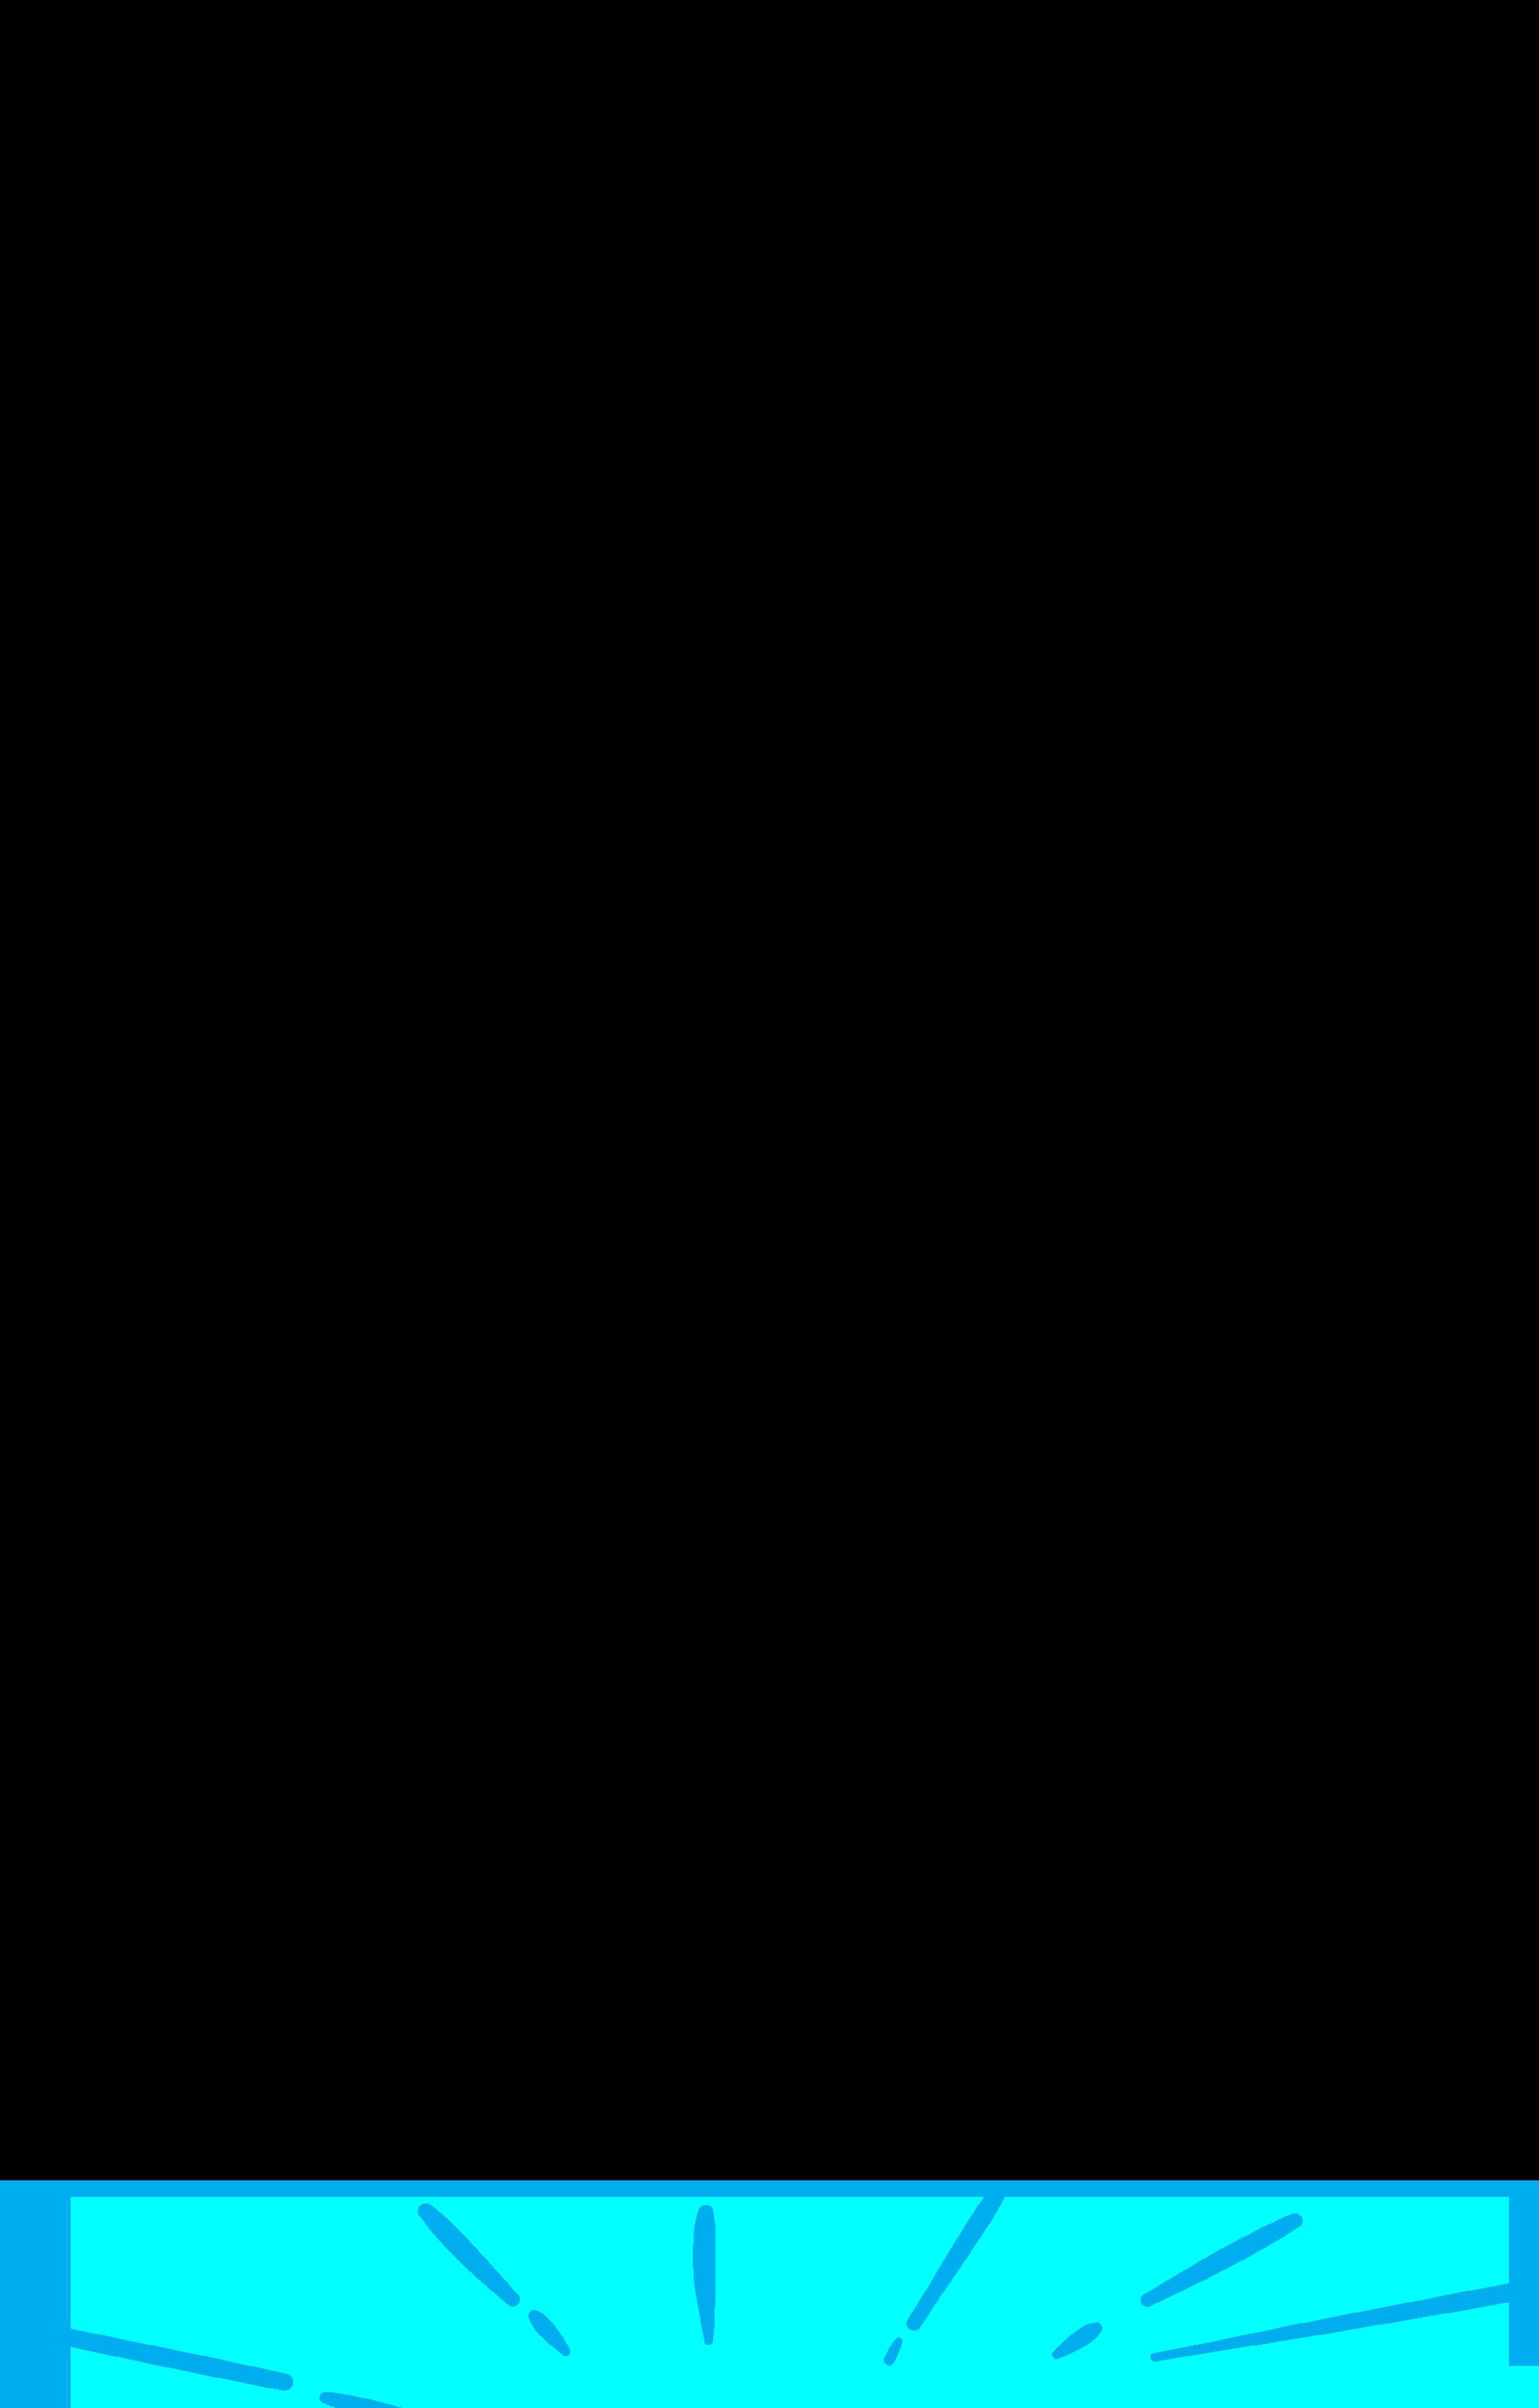 Ipad Vertical_2048x2732_Burst_Blue.png